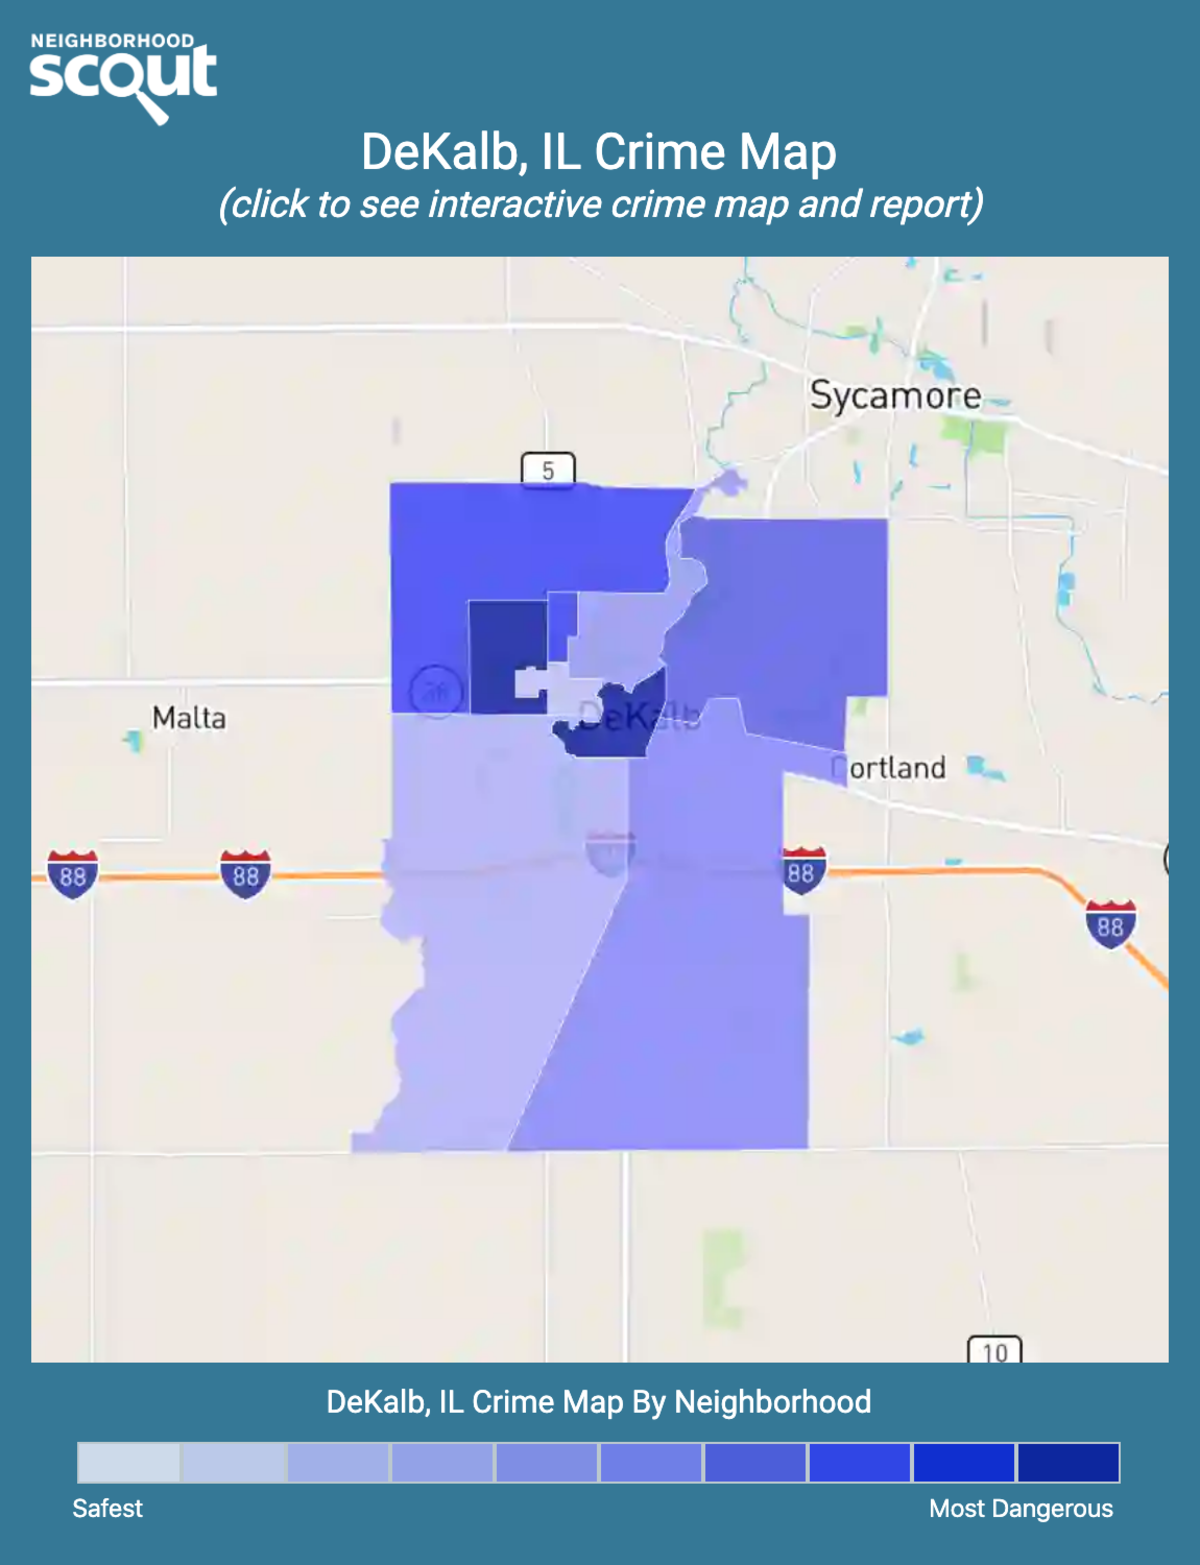 DeKalb, Illinois crime map